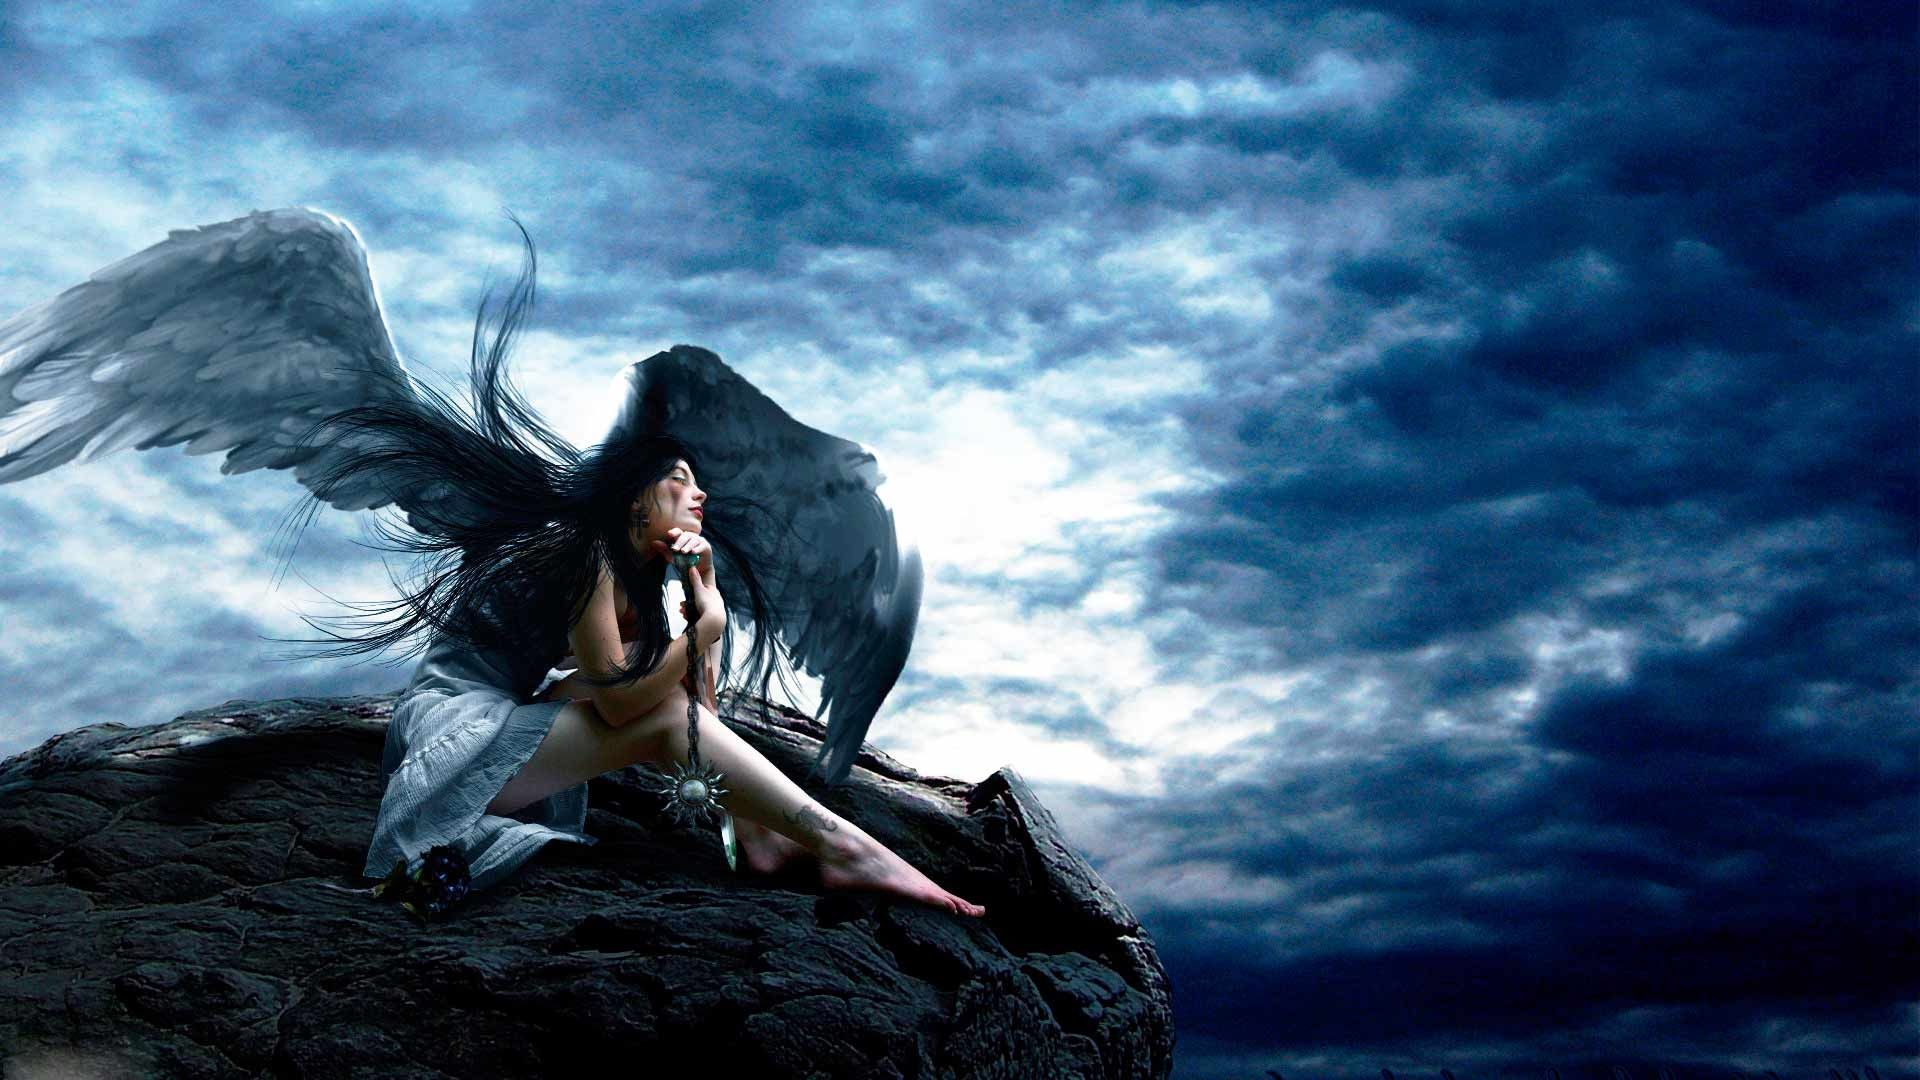 Pictures Of Angel Wings Girl Fallen